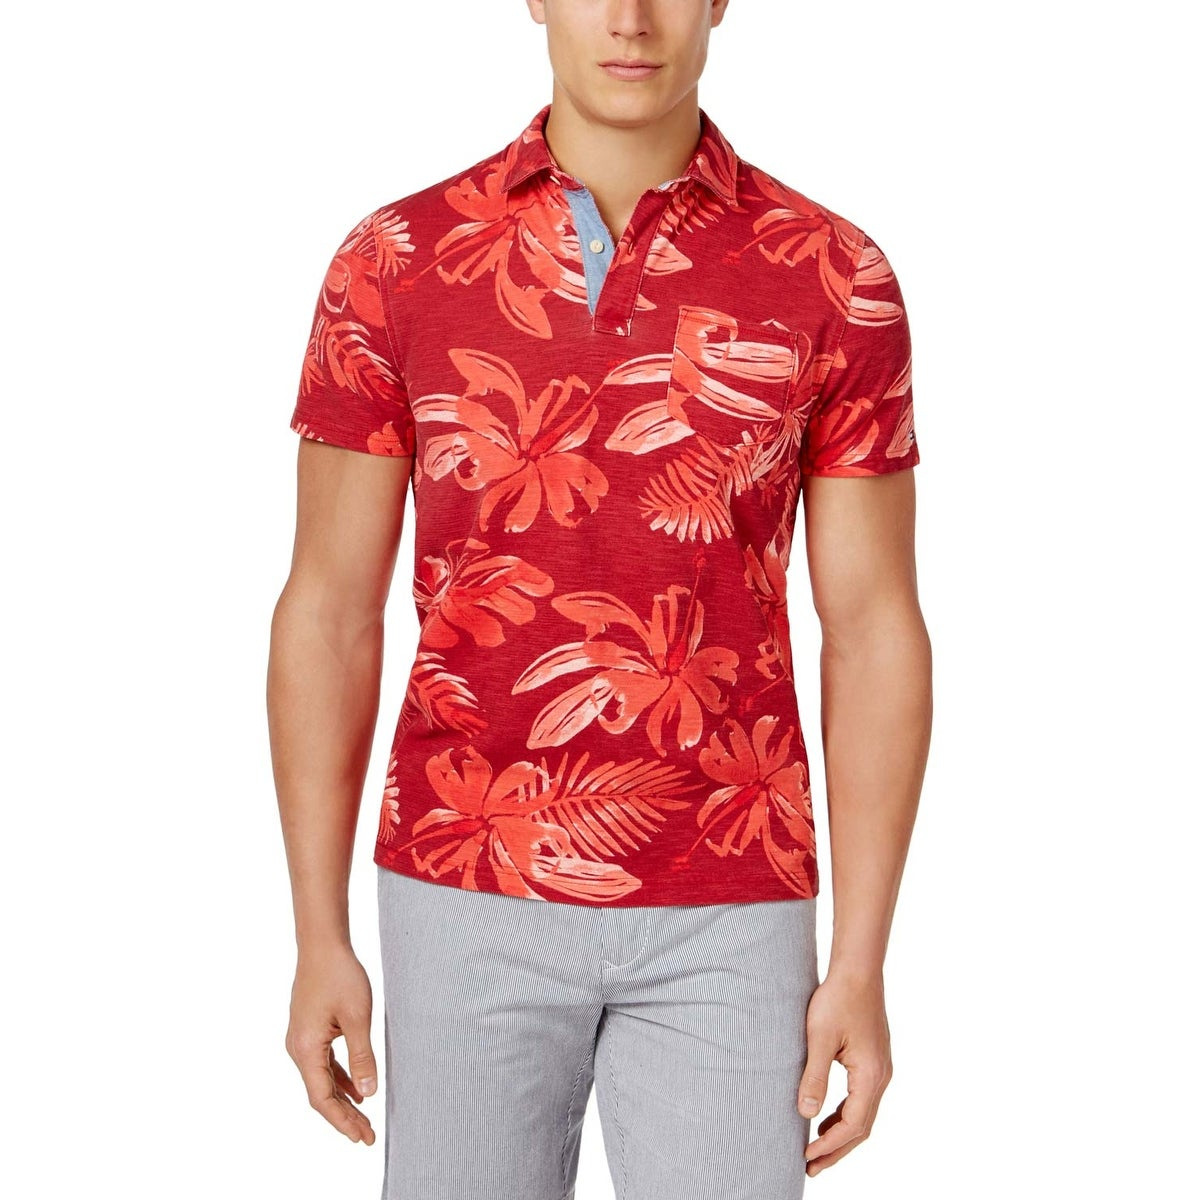 Tommy Hilfiger Mens Custom Fit Solid Color Polo Shirt Joe Maloy